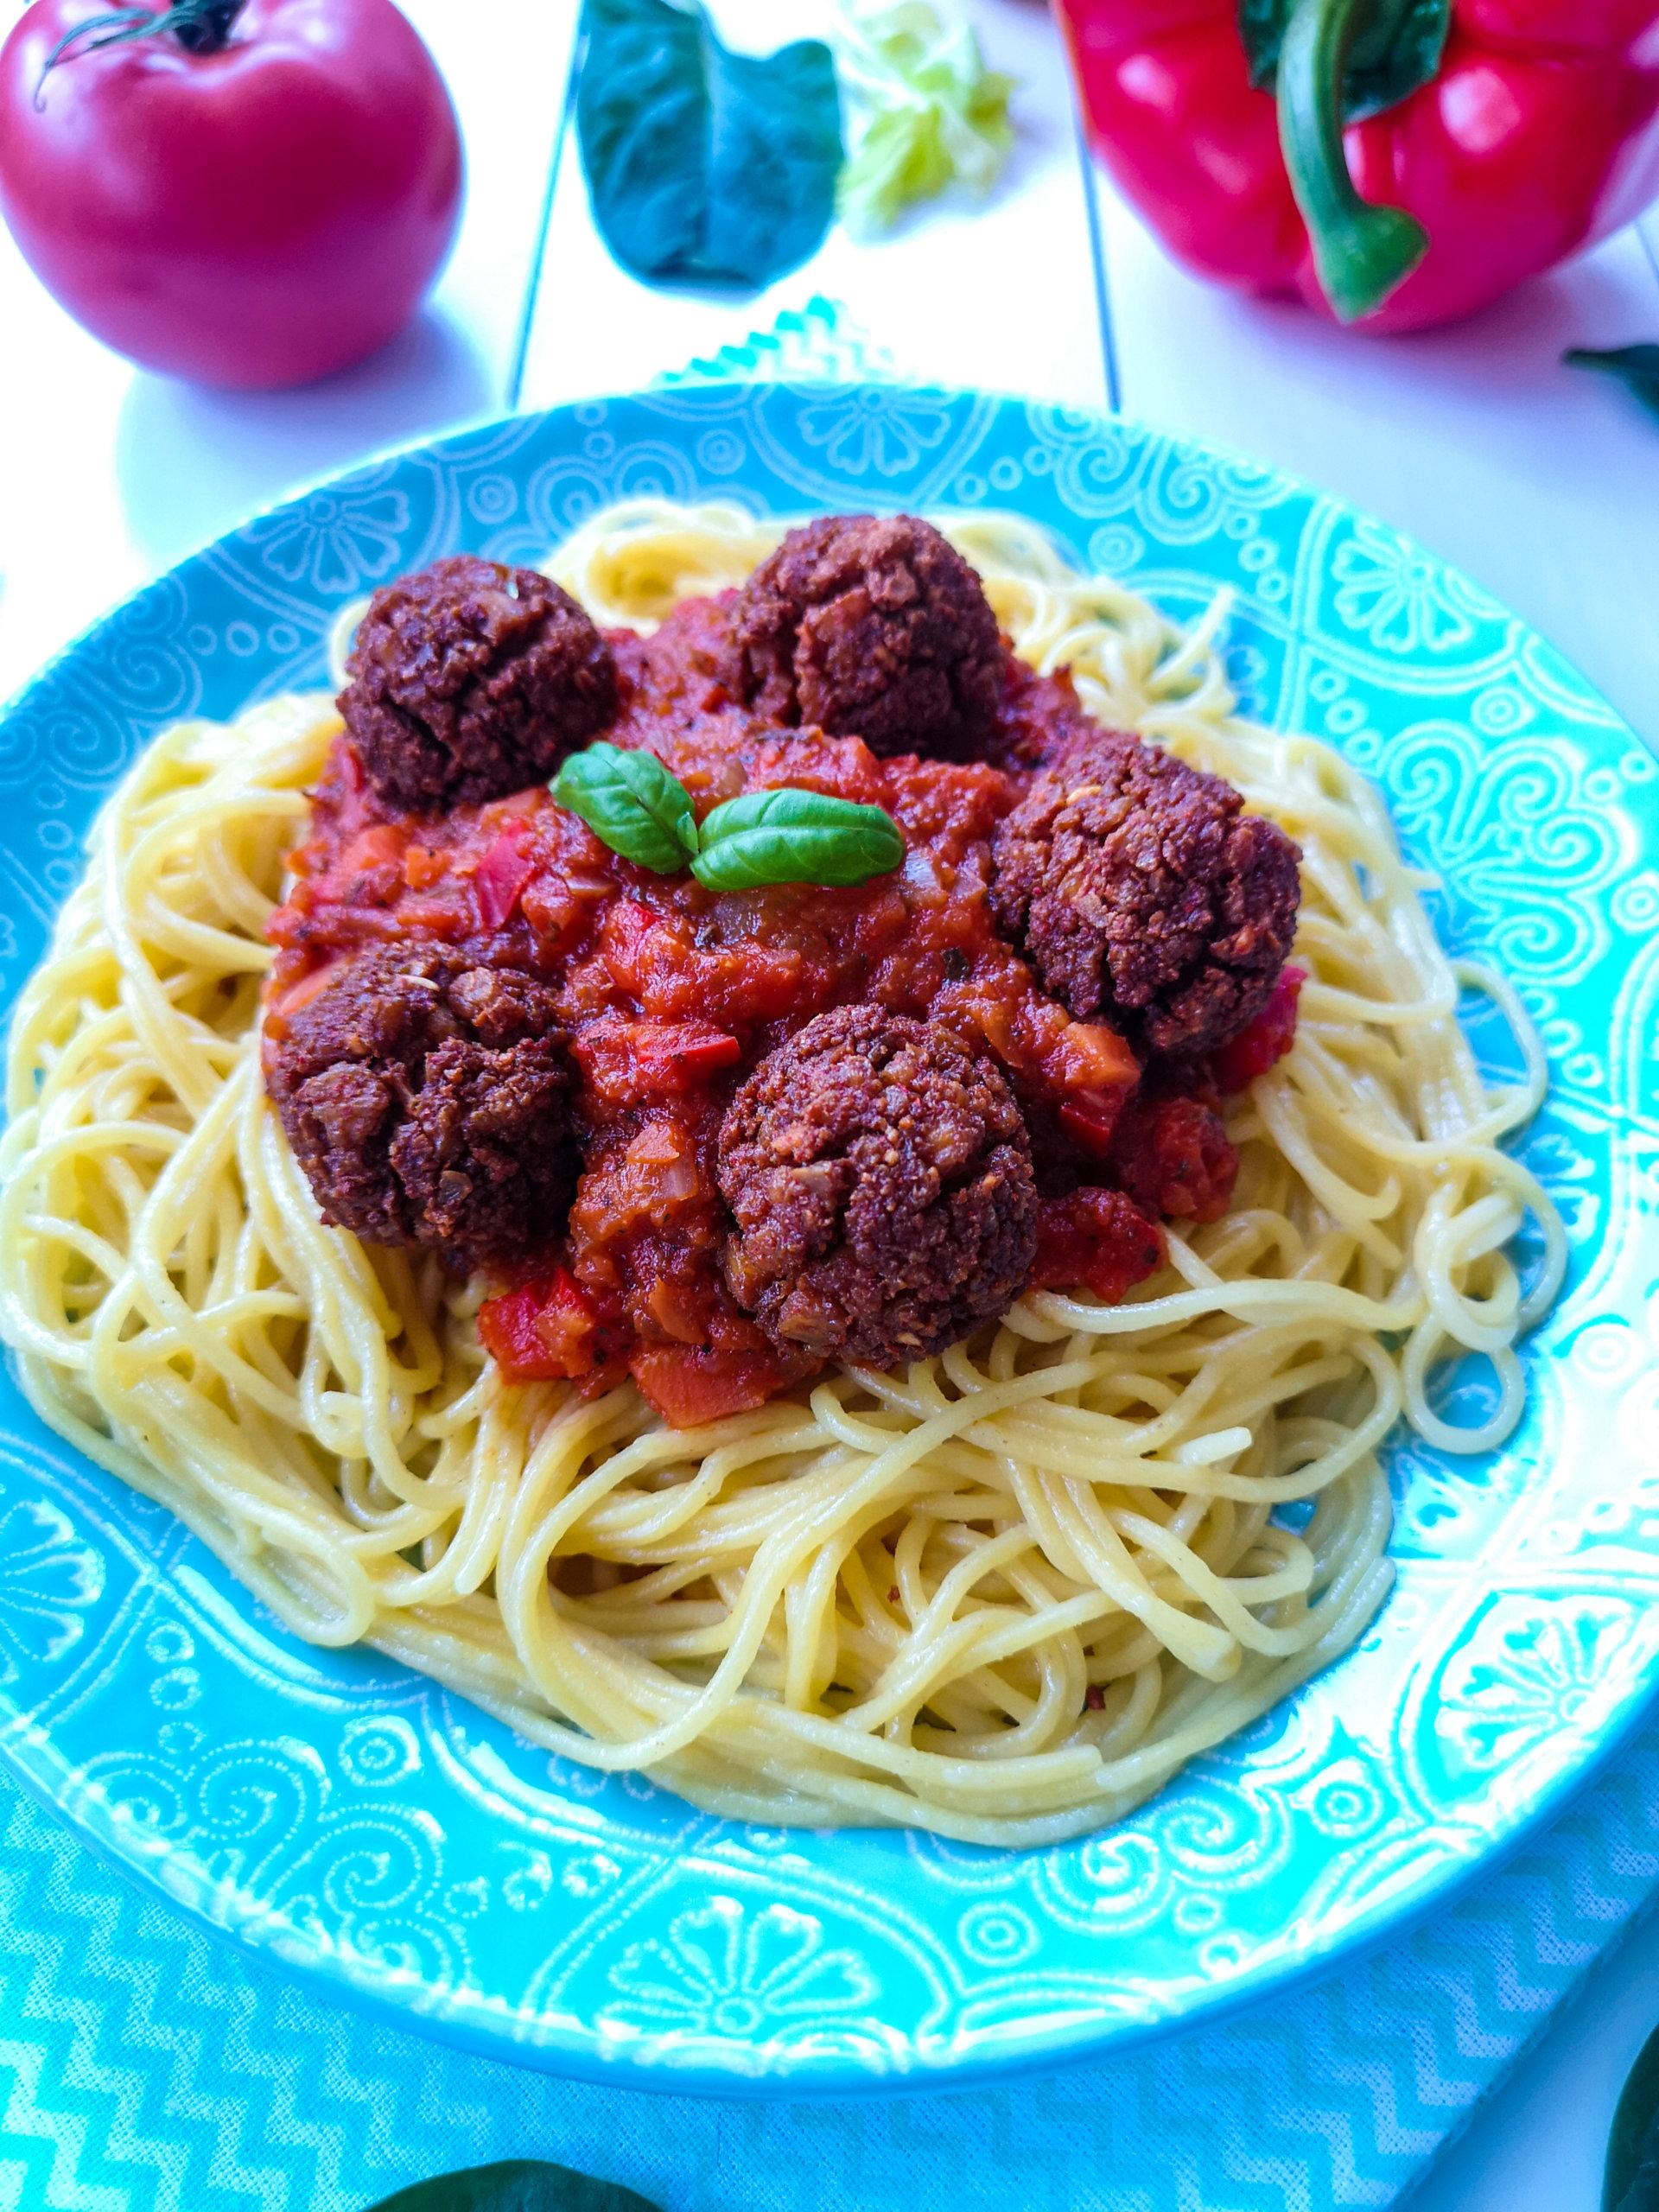 spaghetti zsosem ipulpecikami